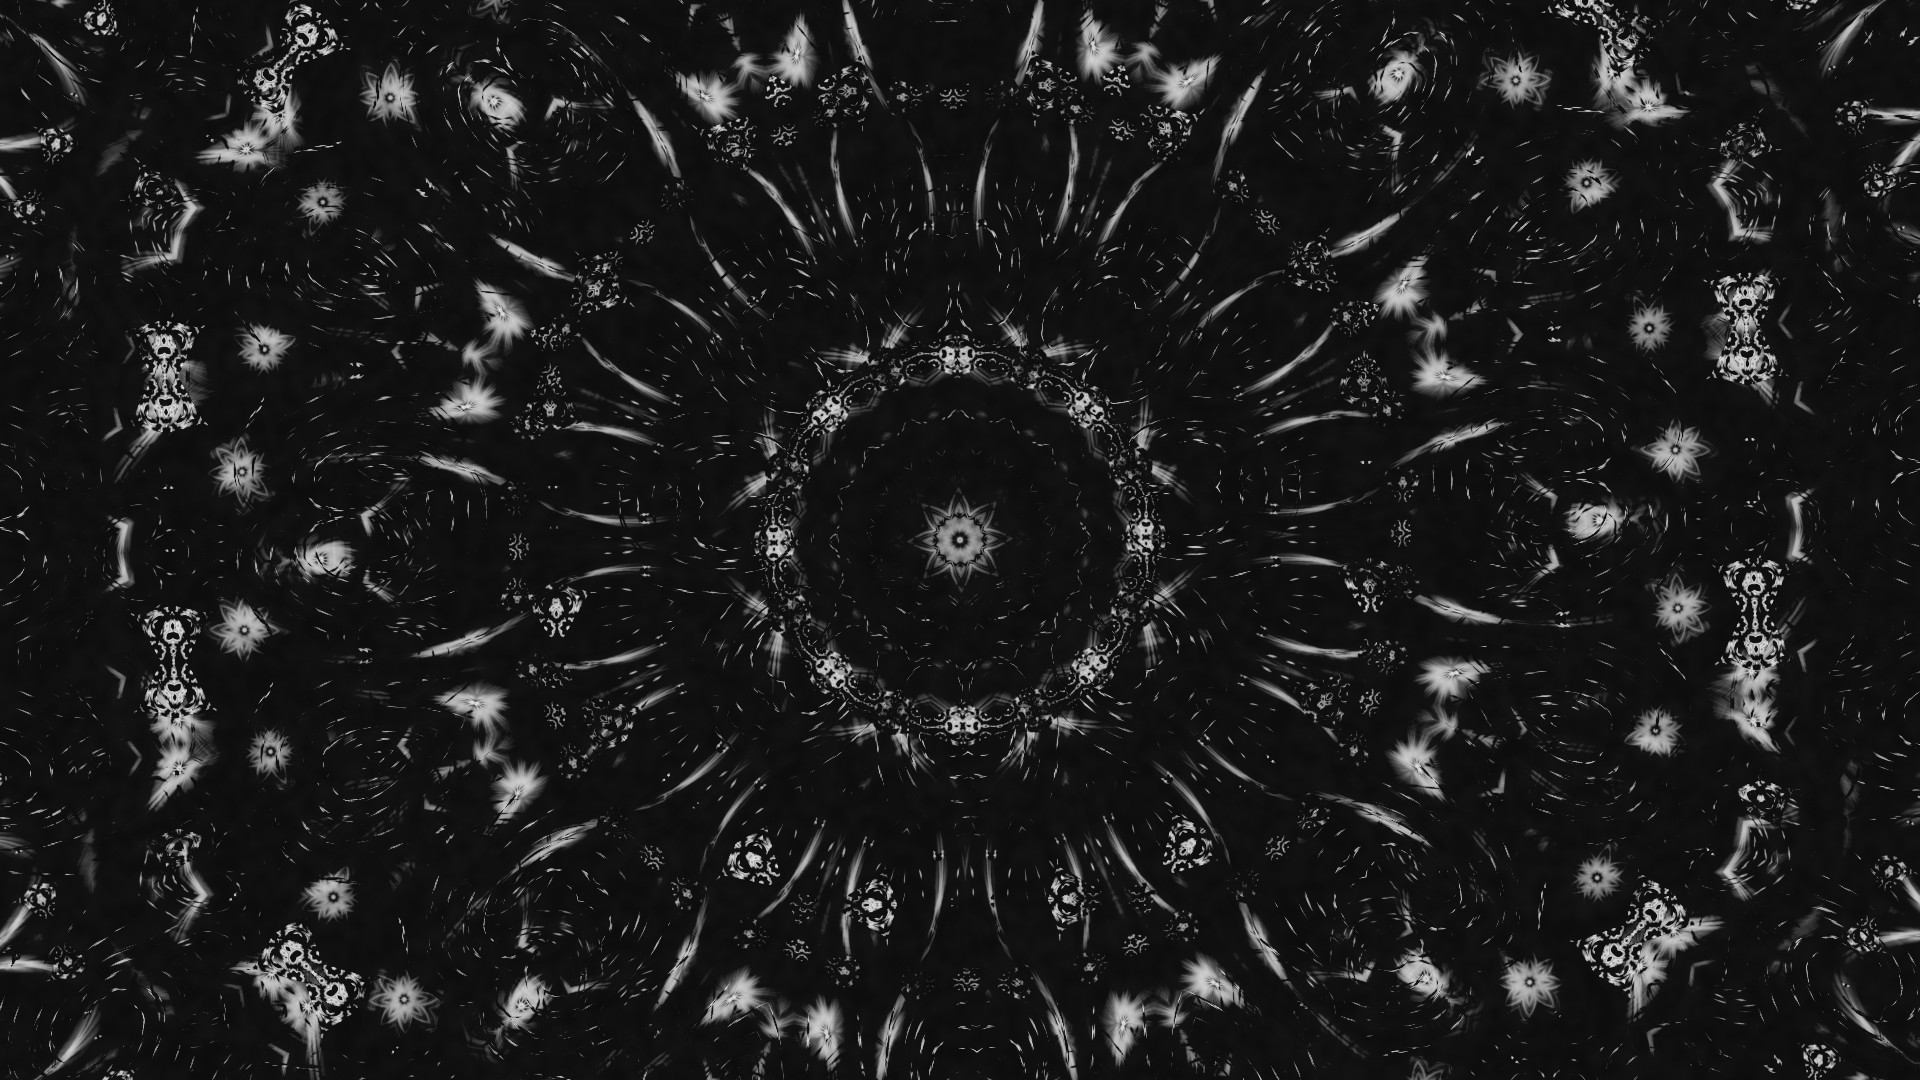 Breath of Eternity - 1920px x 1080px